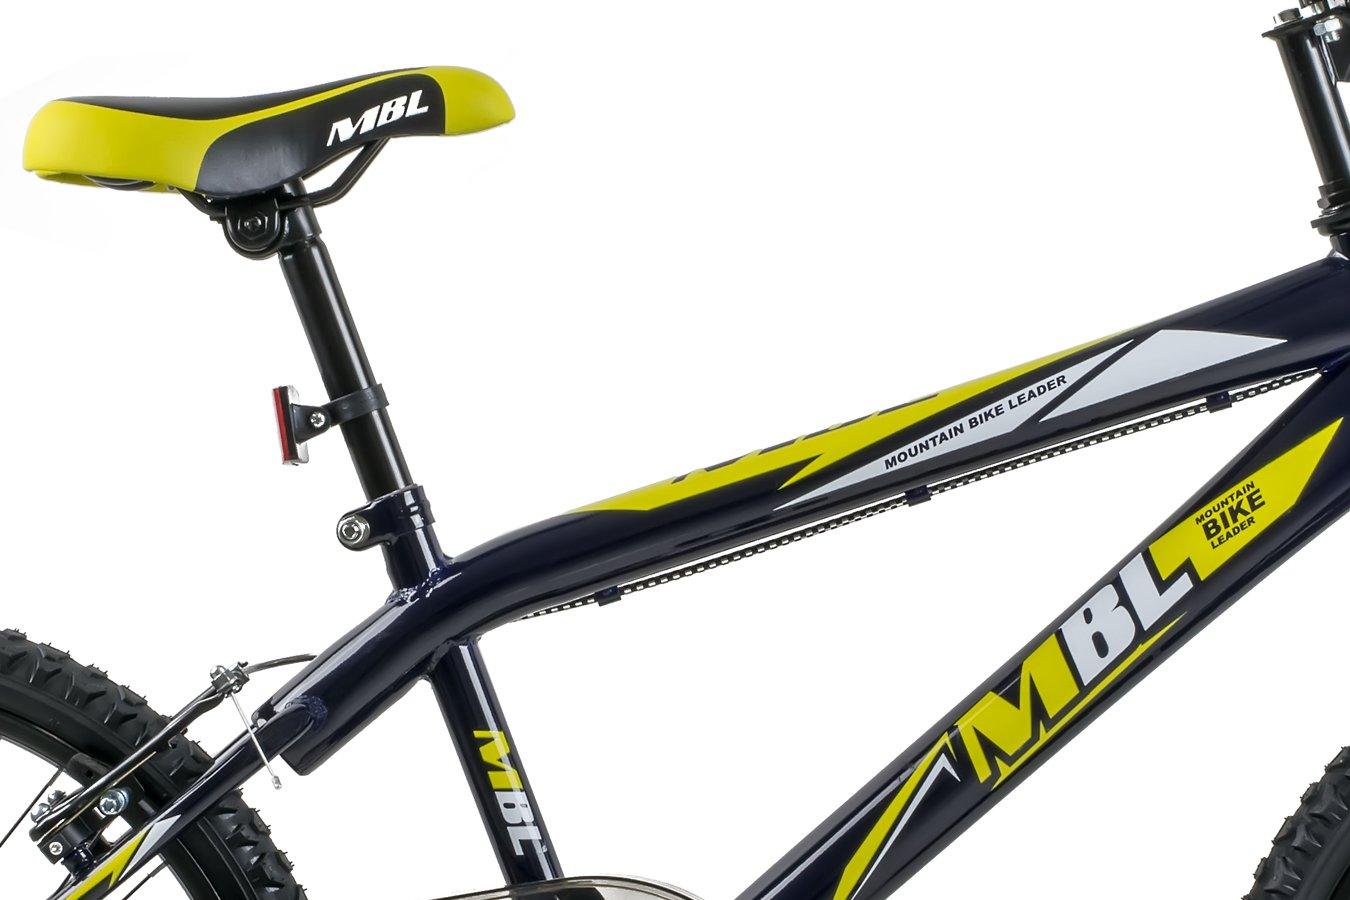 Bicicleta 20 Aço Energy - MBL